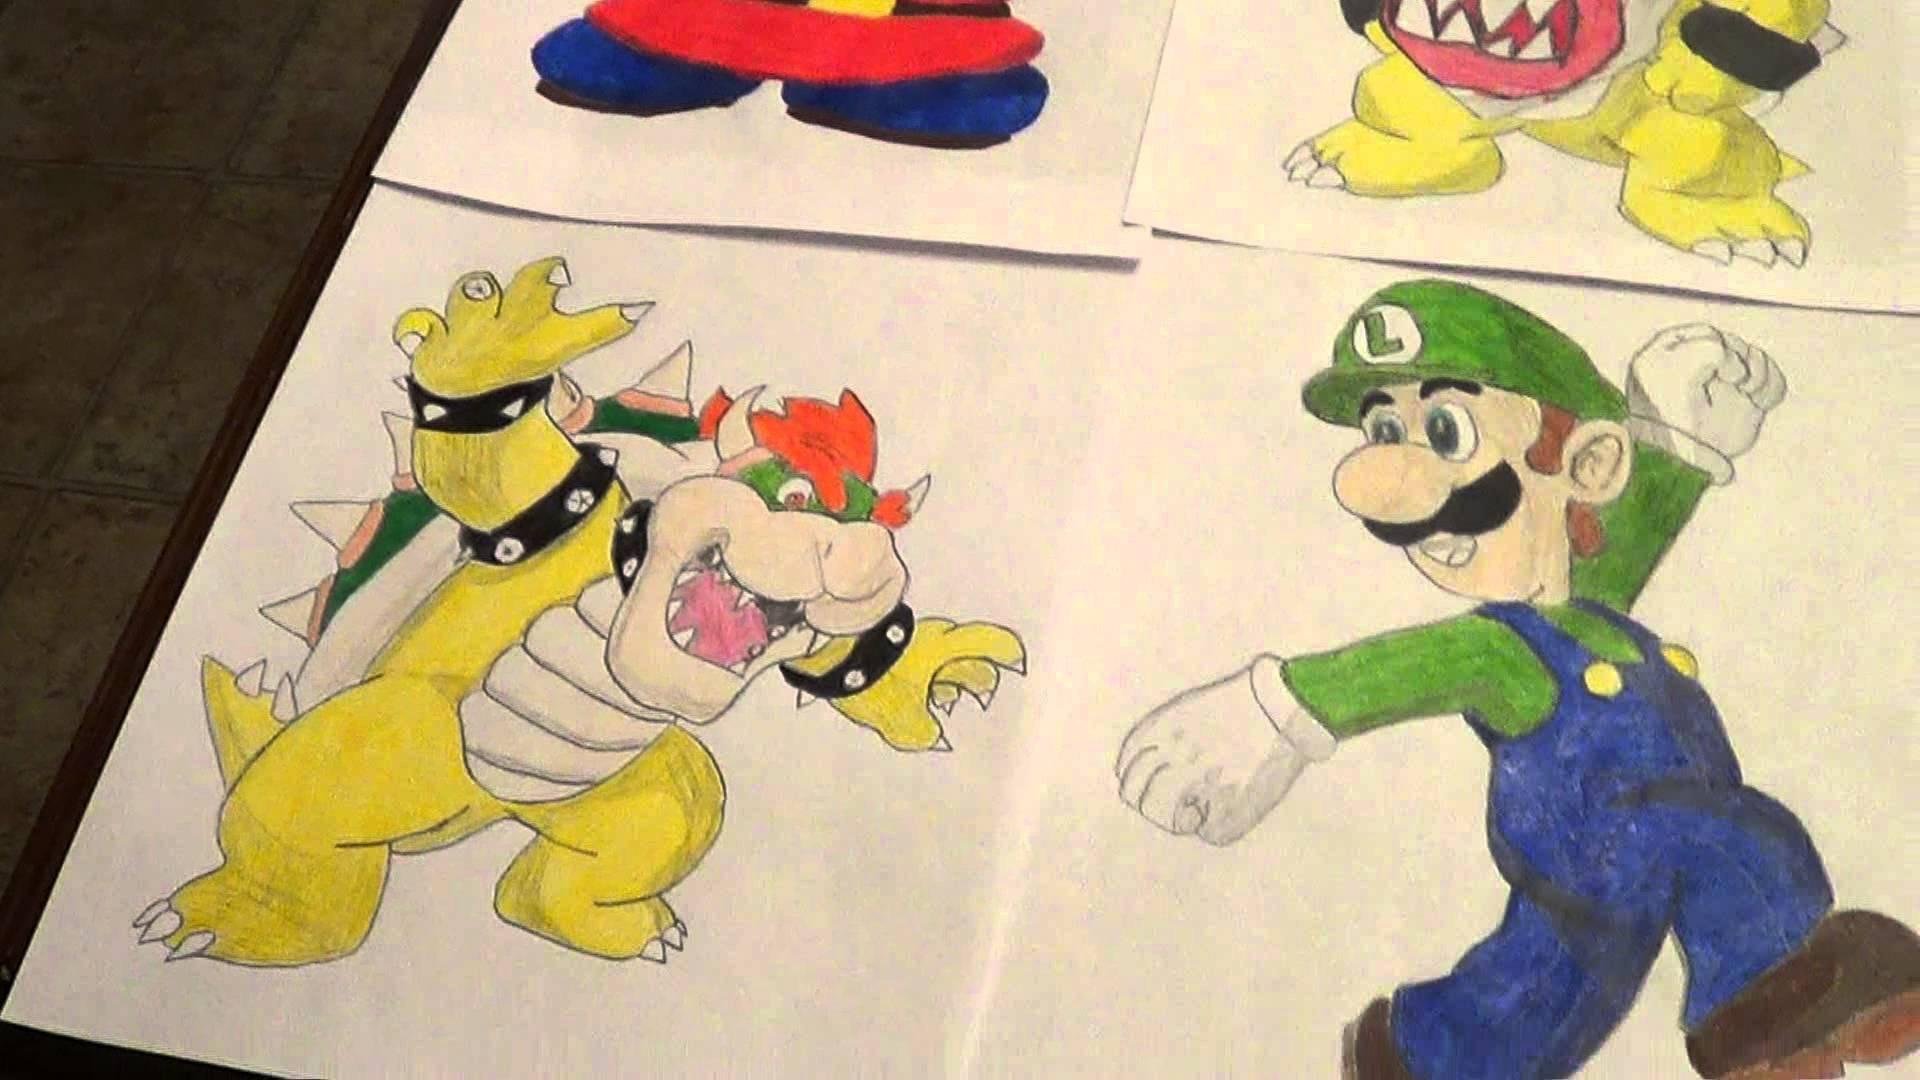 1920x1080 Nintendo Drawings Super Mario Series